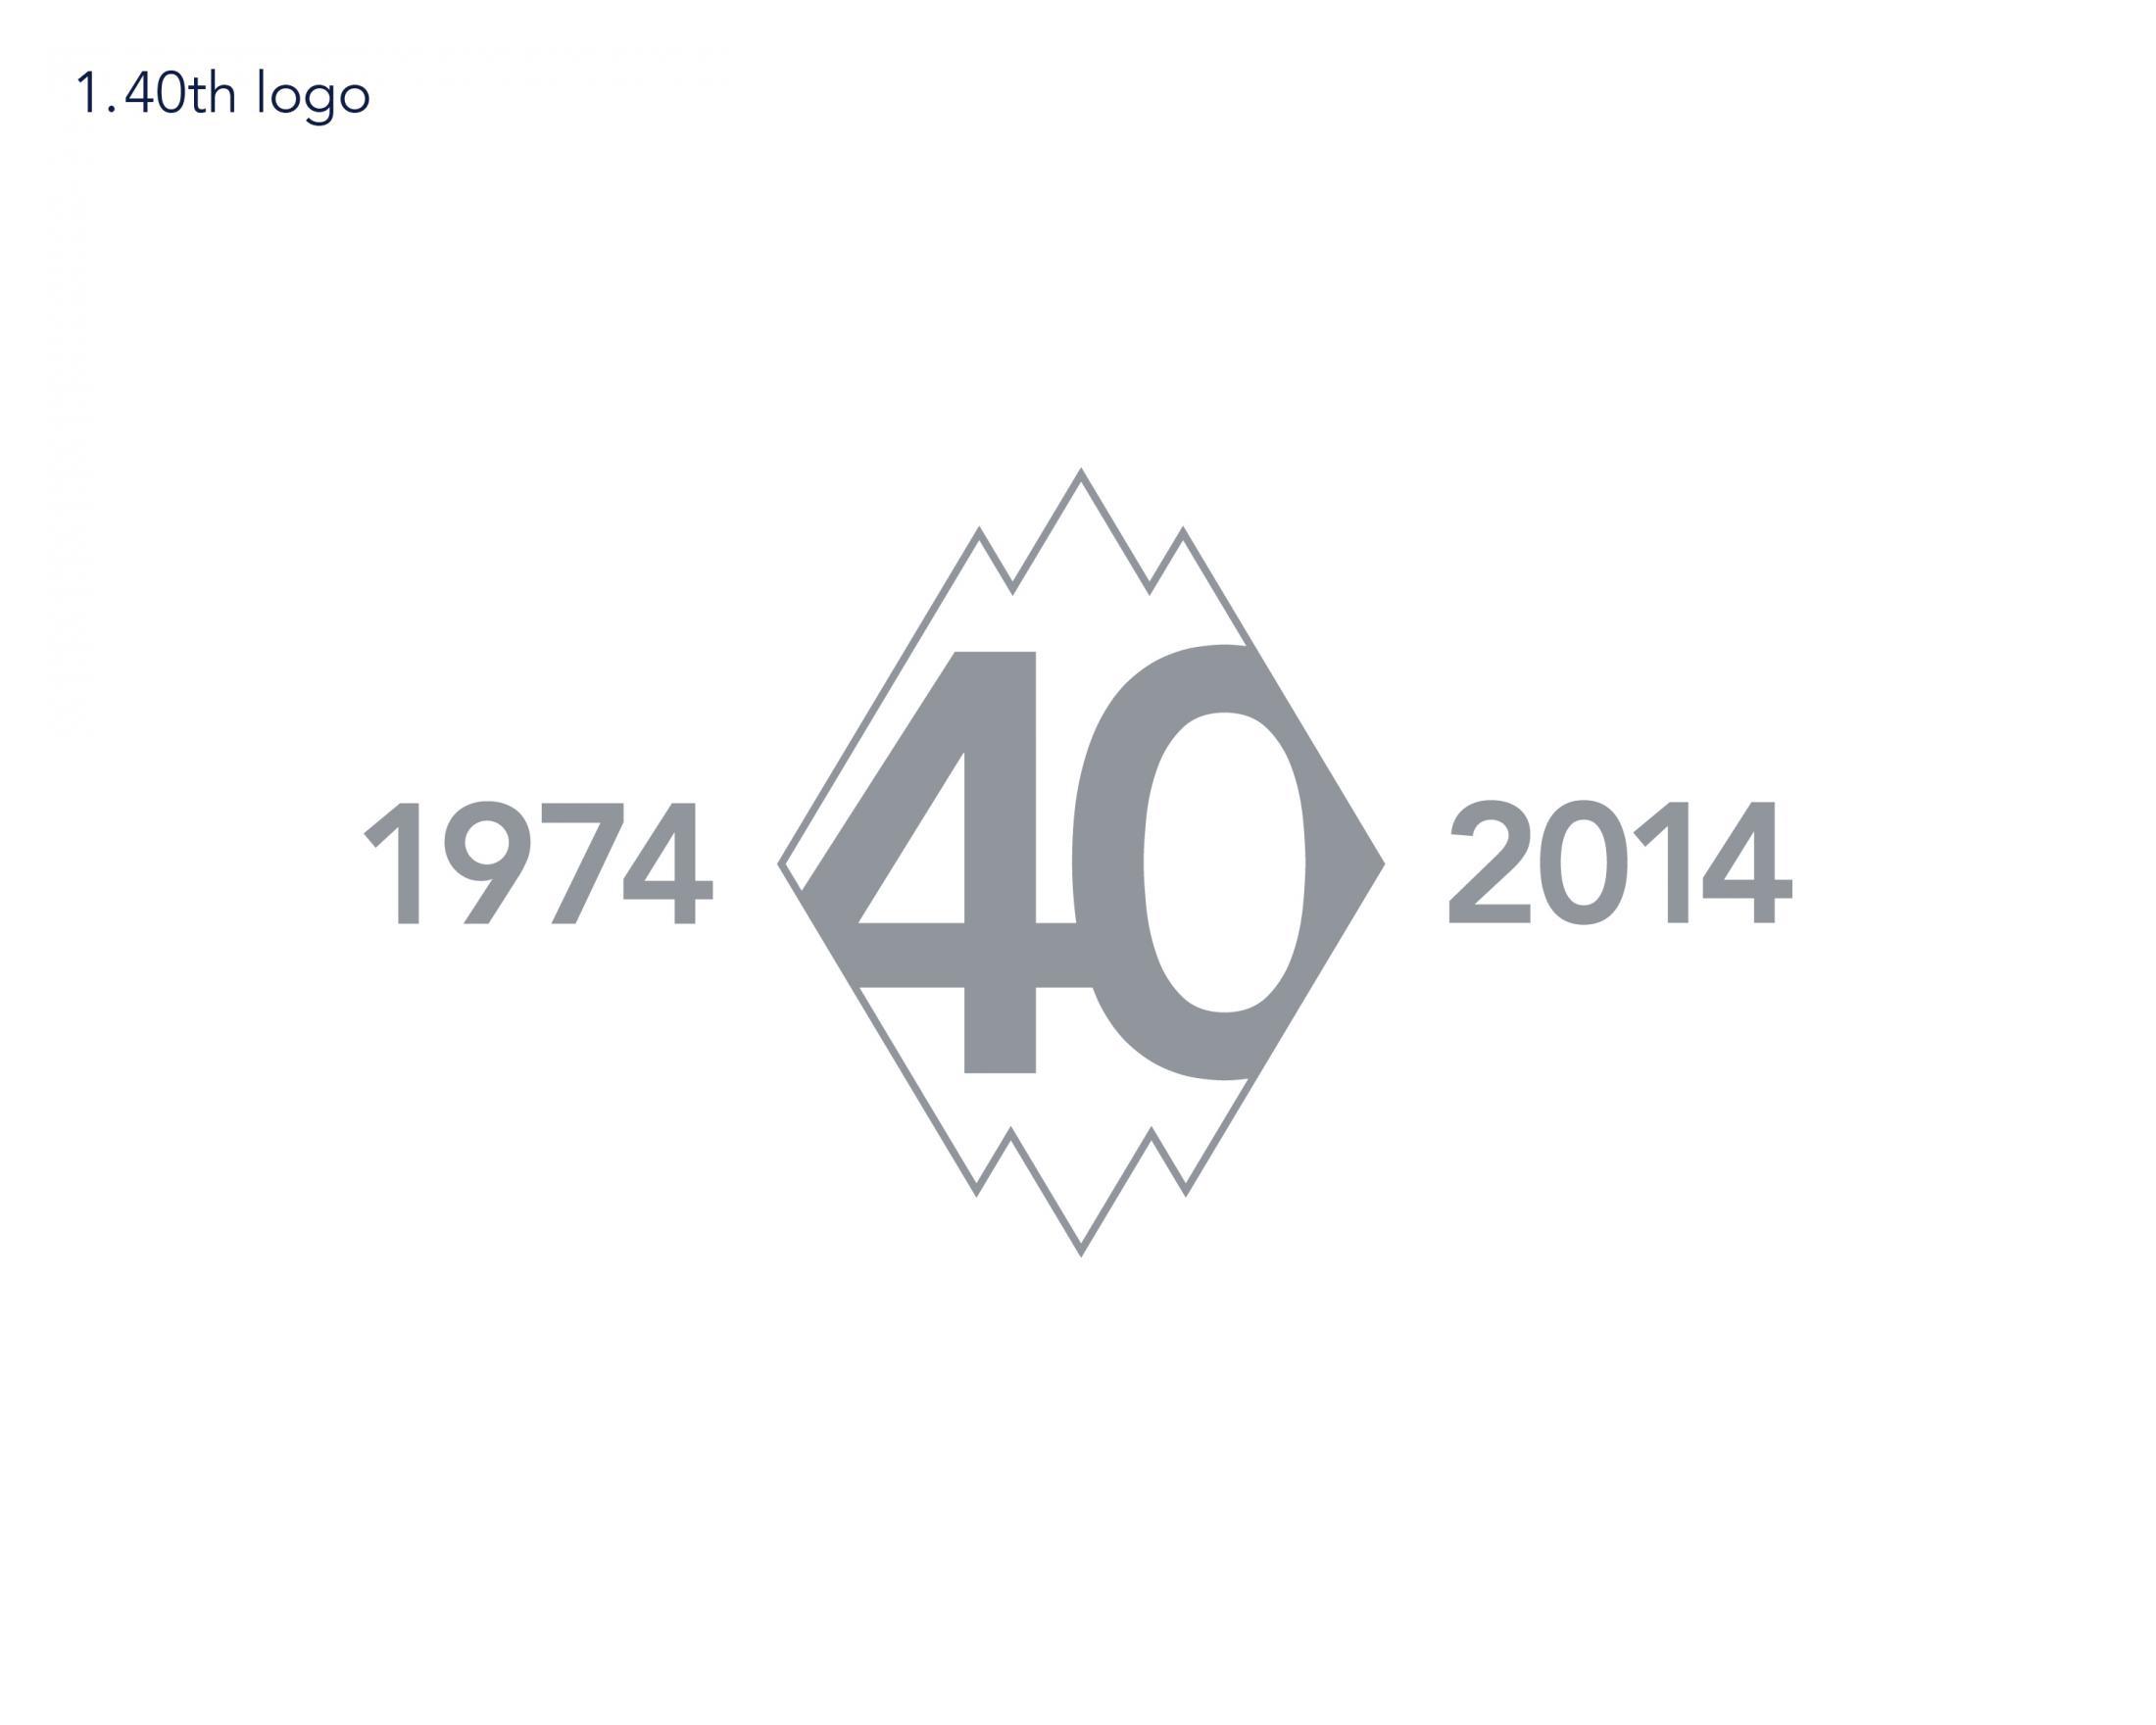 Thumbnail for Whitecaps FC 40th Anniversary